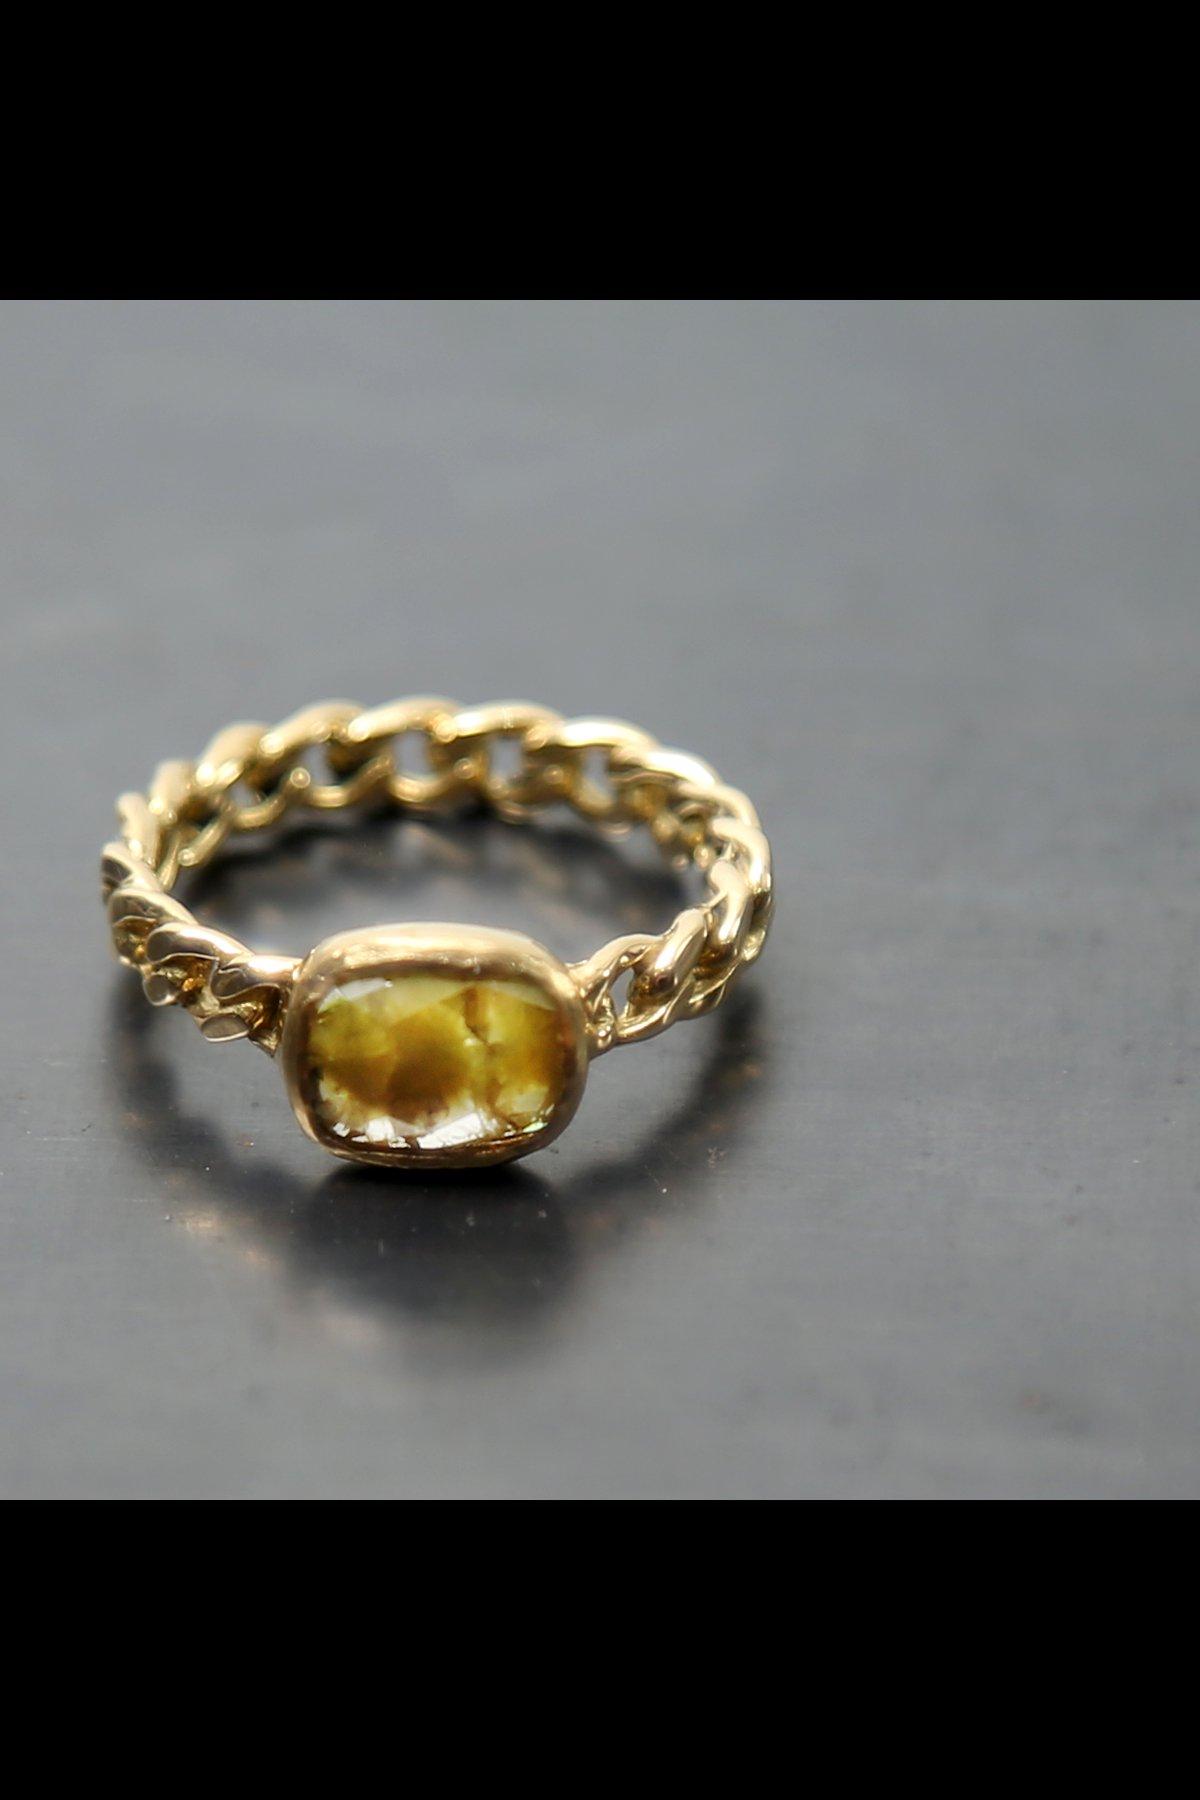 CLASSIC CHAIN DIAMOND RING N.8A-ODR3